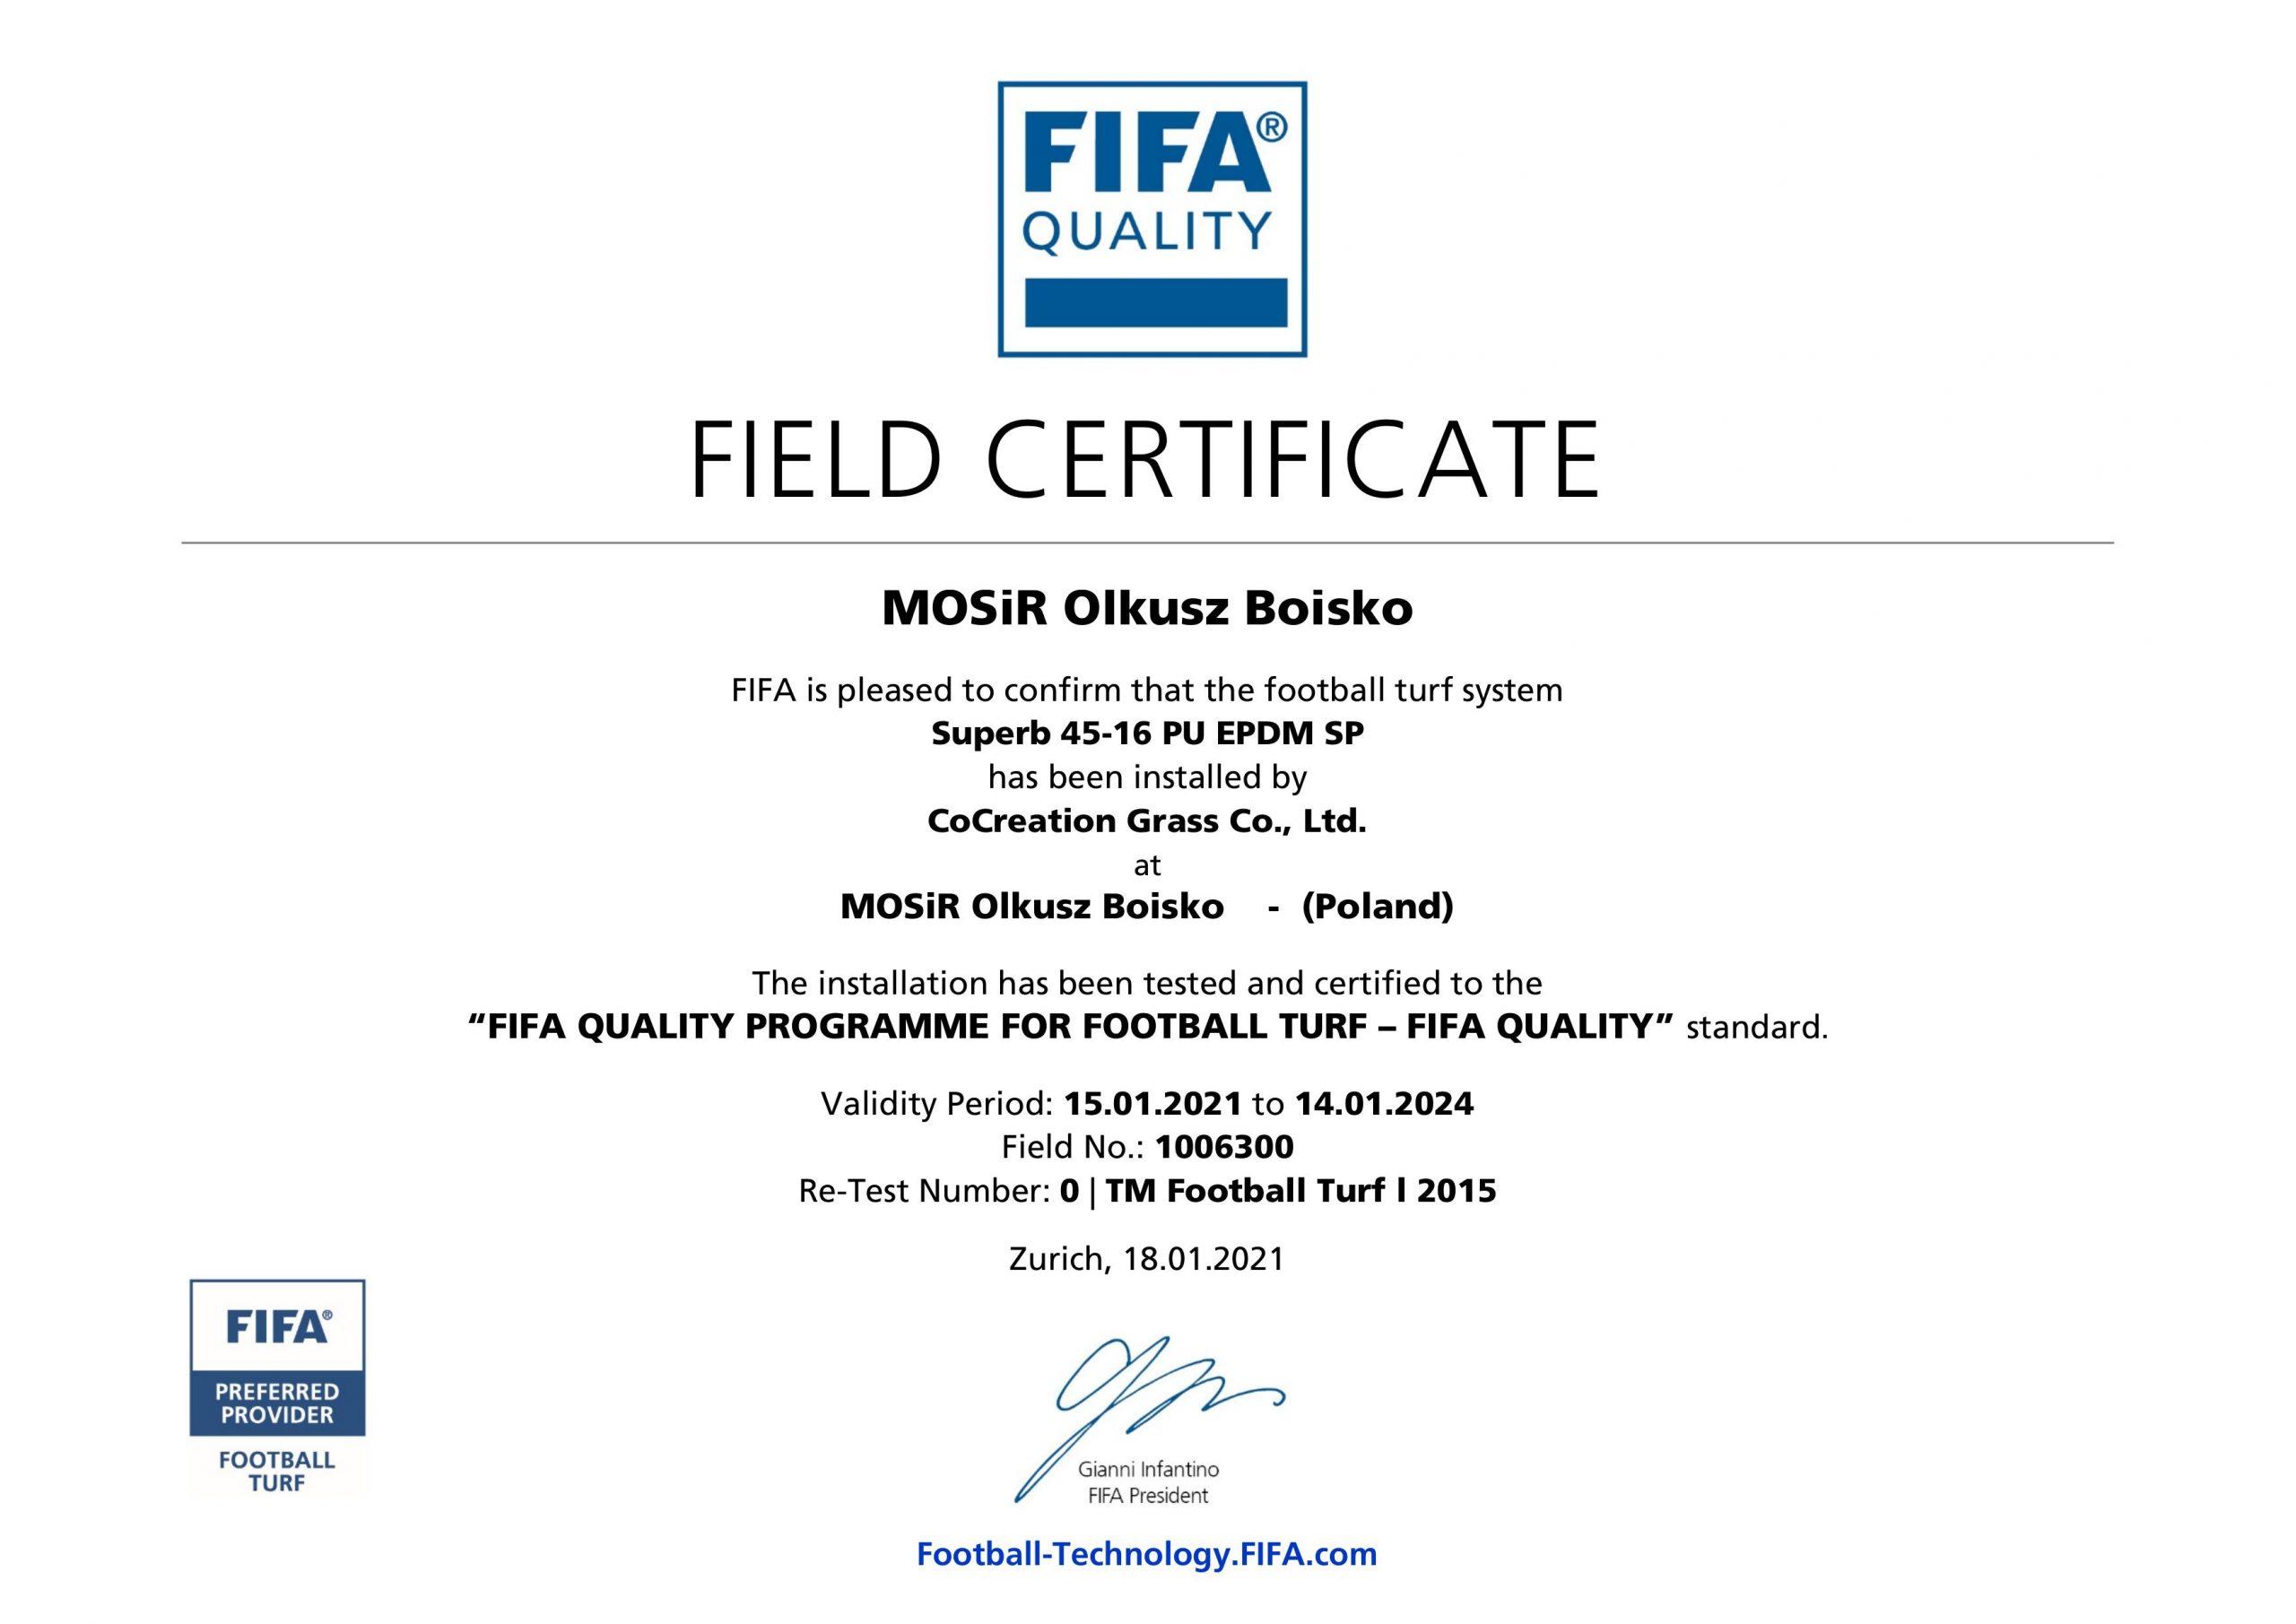 MOSiR Olkusz Boisko Certification